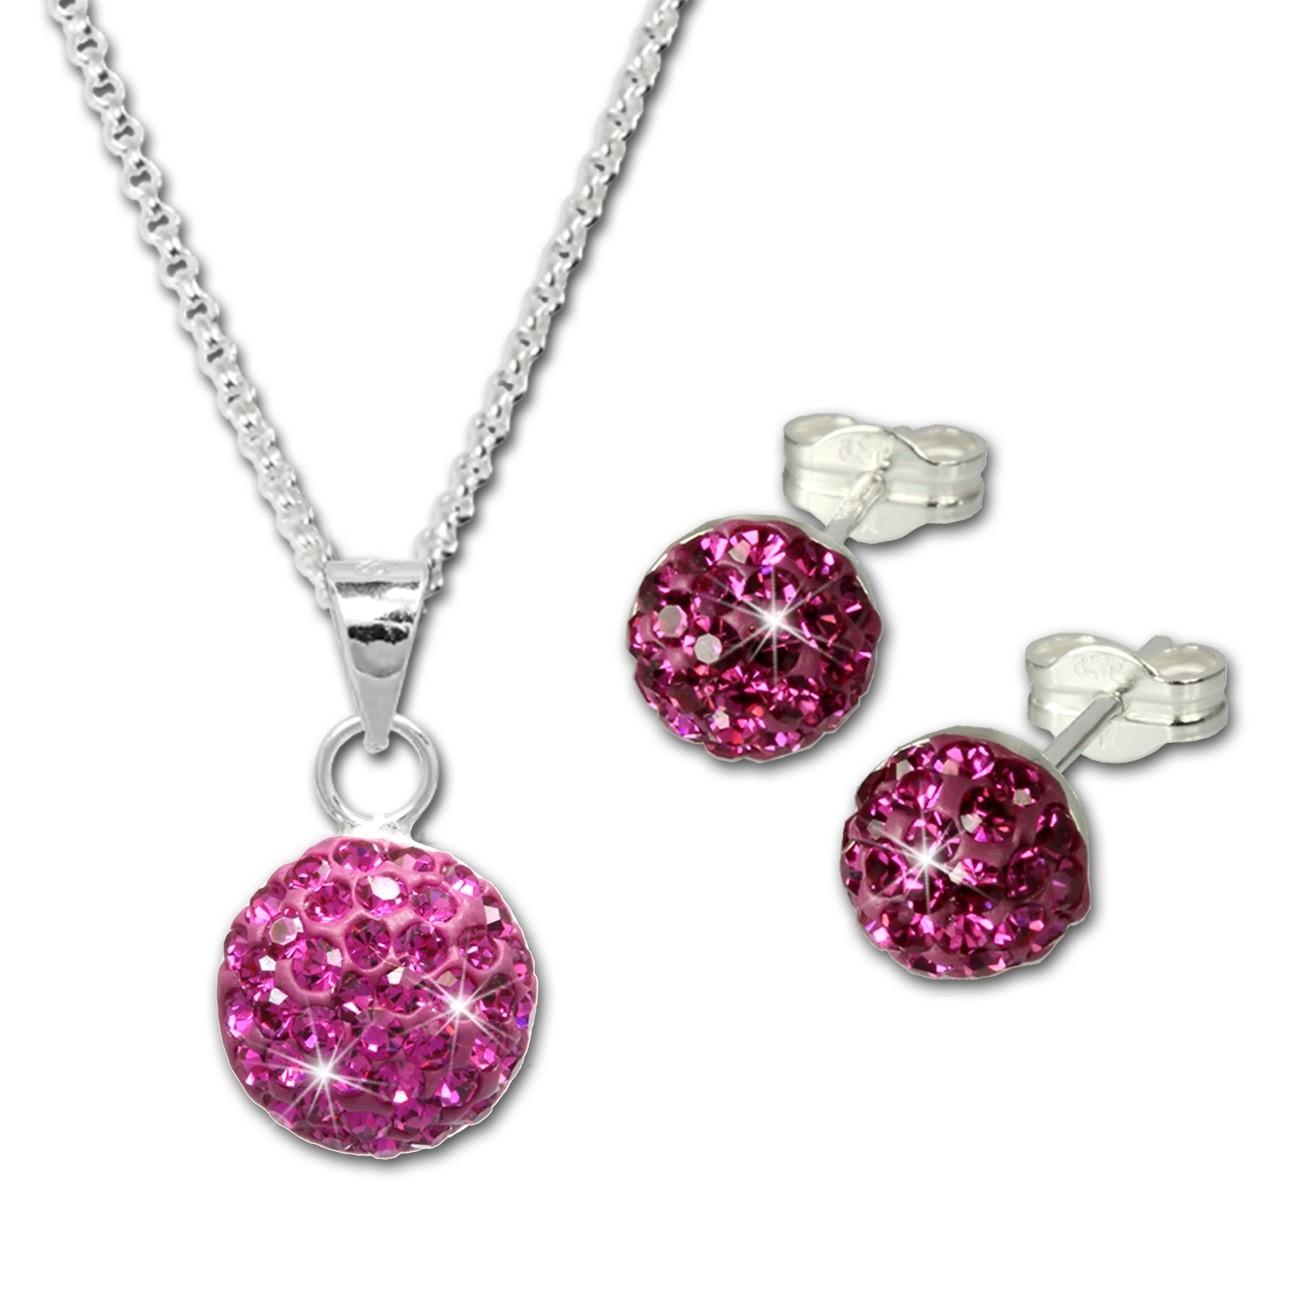 SilberDream Glitzer Set Pink Kette Anhänger Ohrringe 925 Silber GSS053P